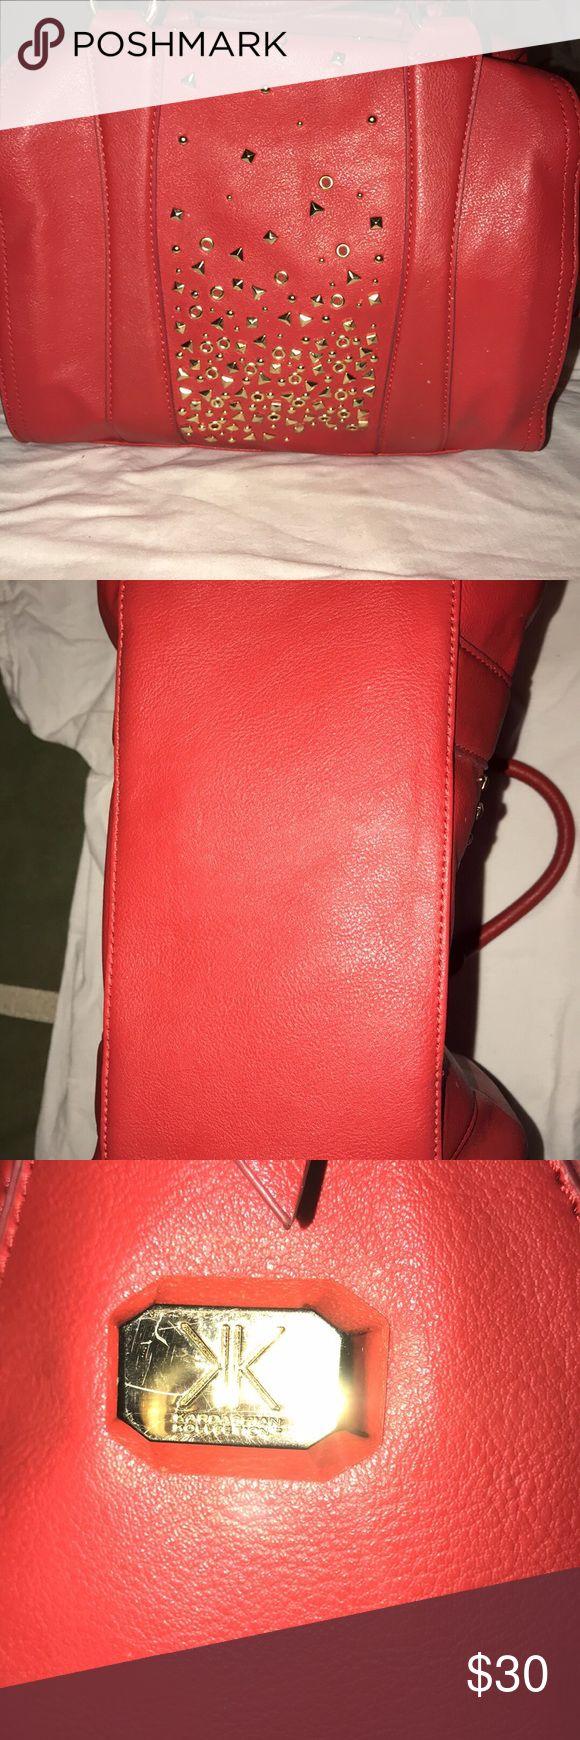 Kim Kardshian bag, beautiful red, no flaws Beautiful, look at pics Kardashian Kollection Other